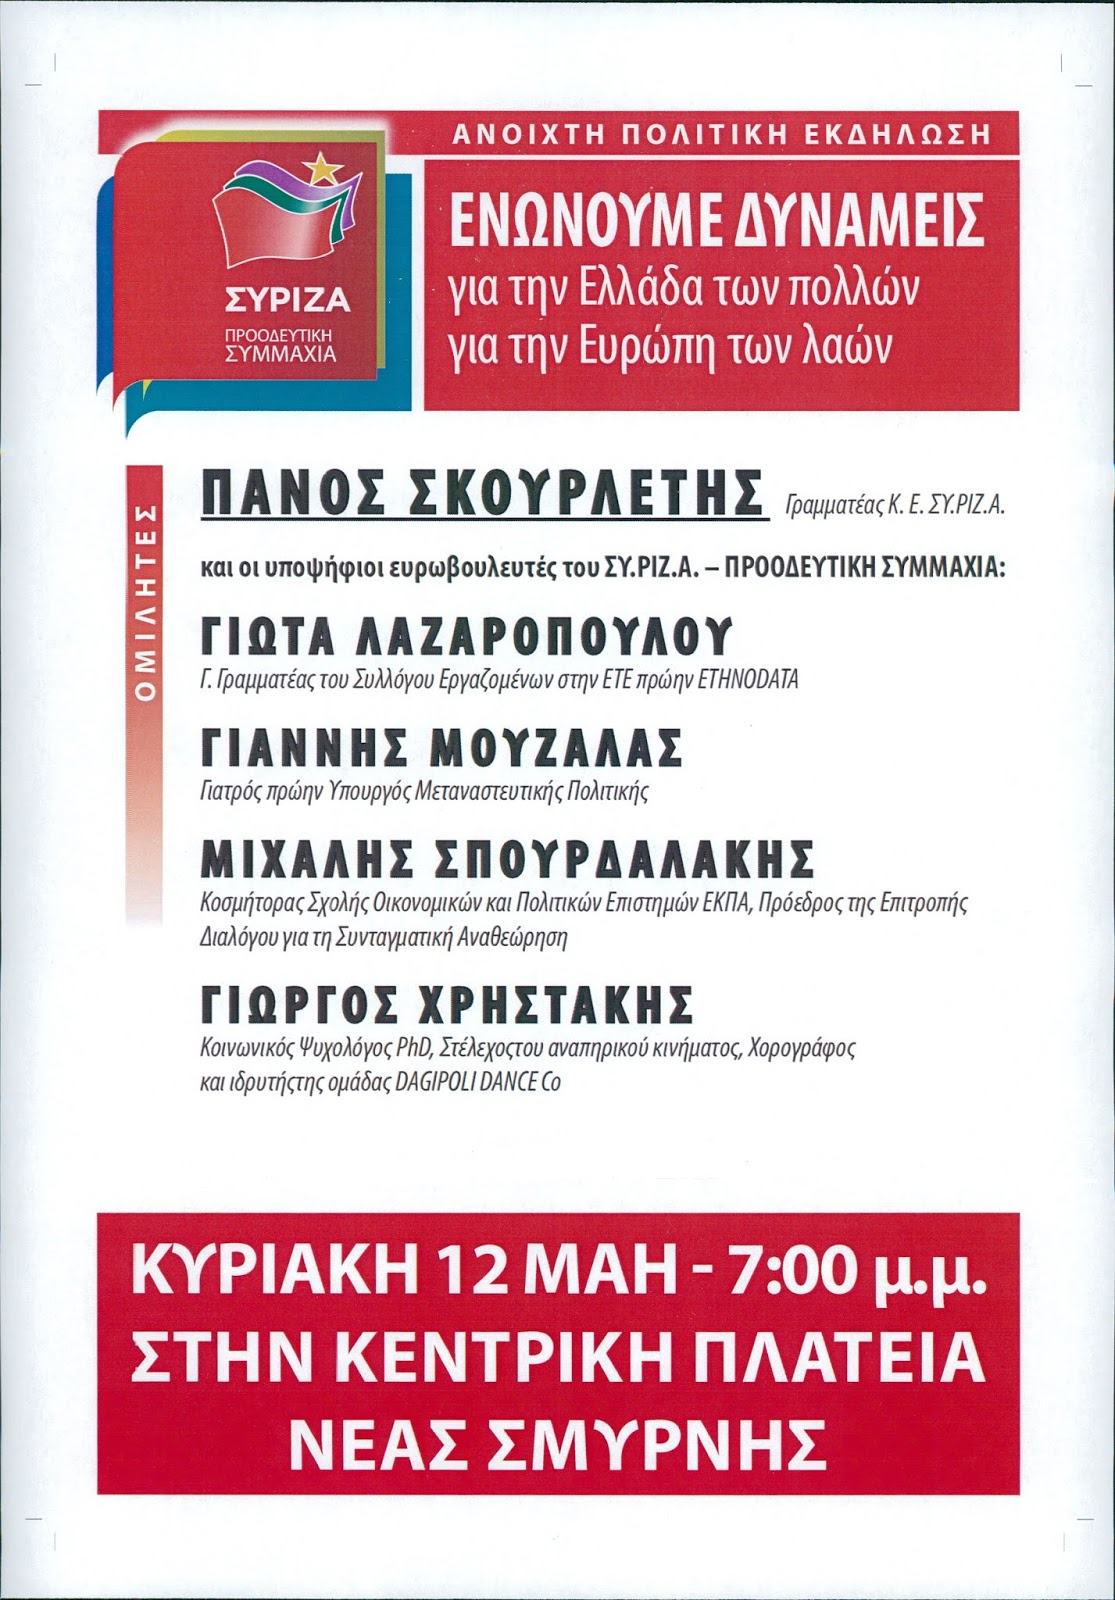 7c426bdad294 Αναρτήθηκε από ΣΥΡΙΖΑ ΓΛΥΦΑΔΑΣ στις 11.5.19 Δεν υπάρχουν σχόλια